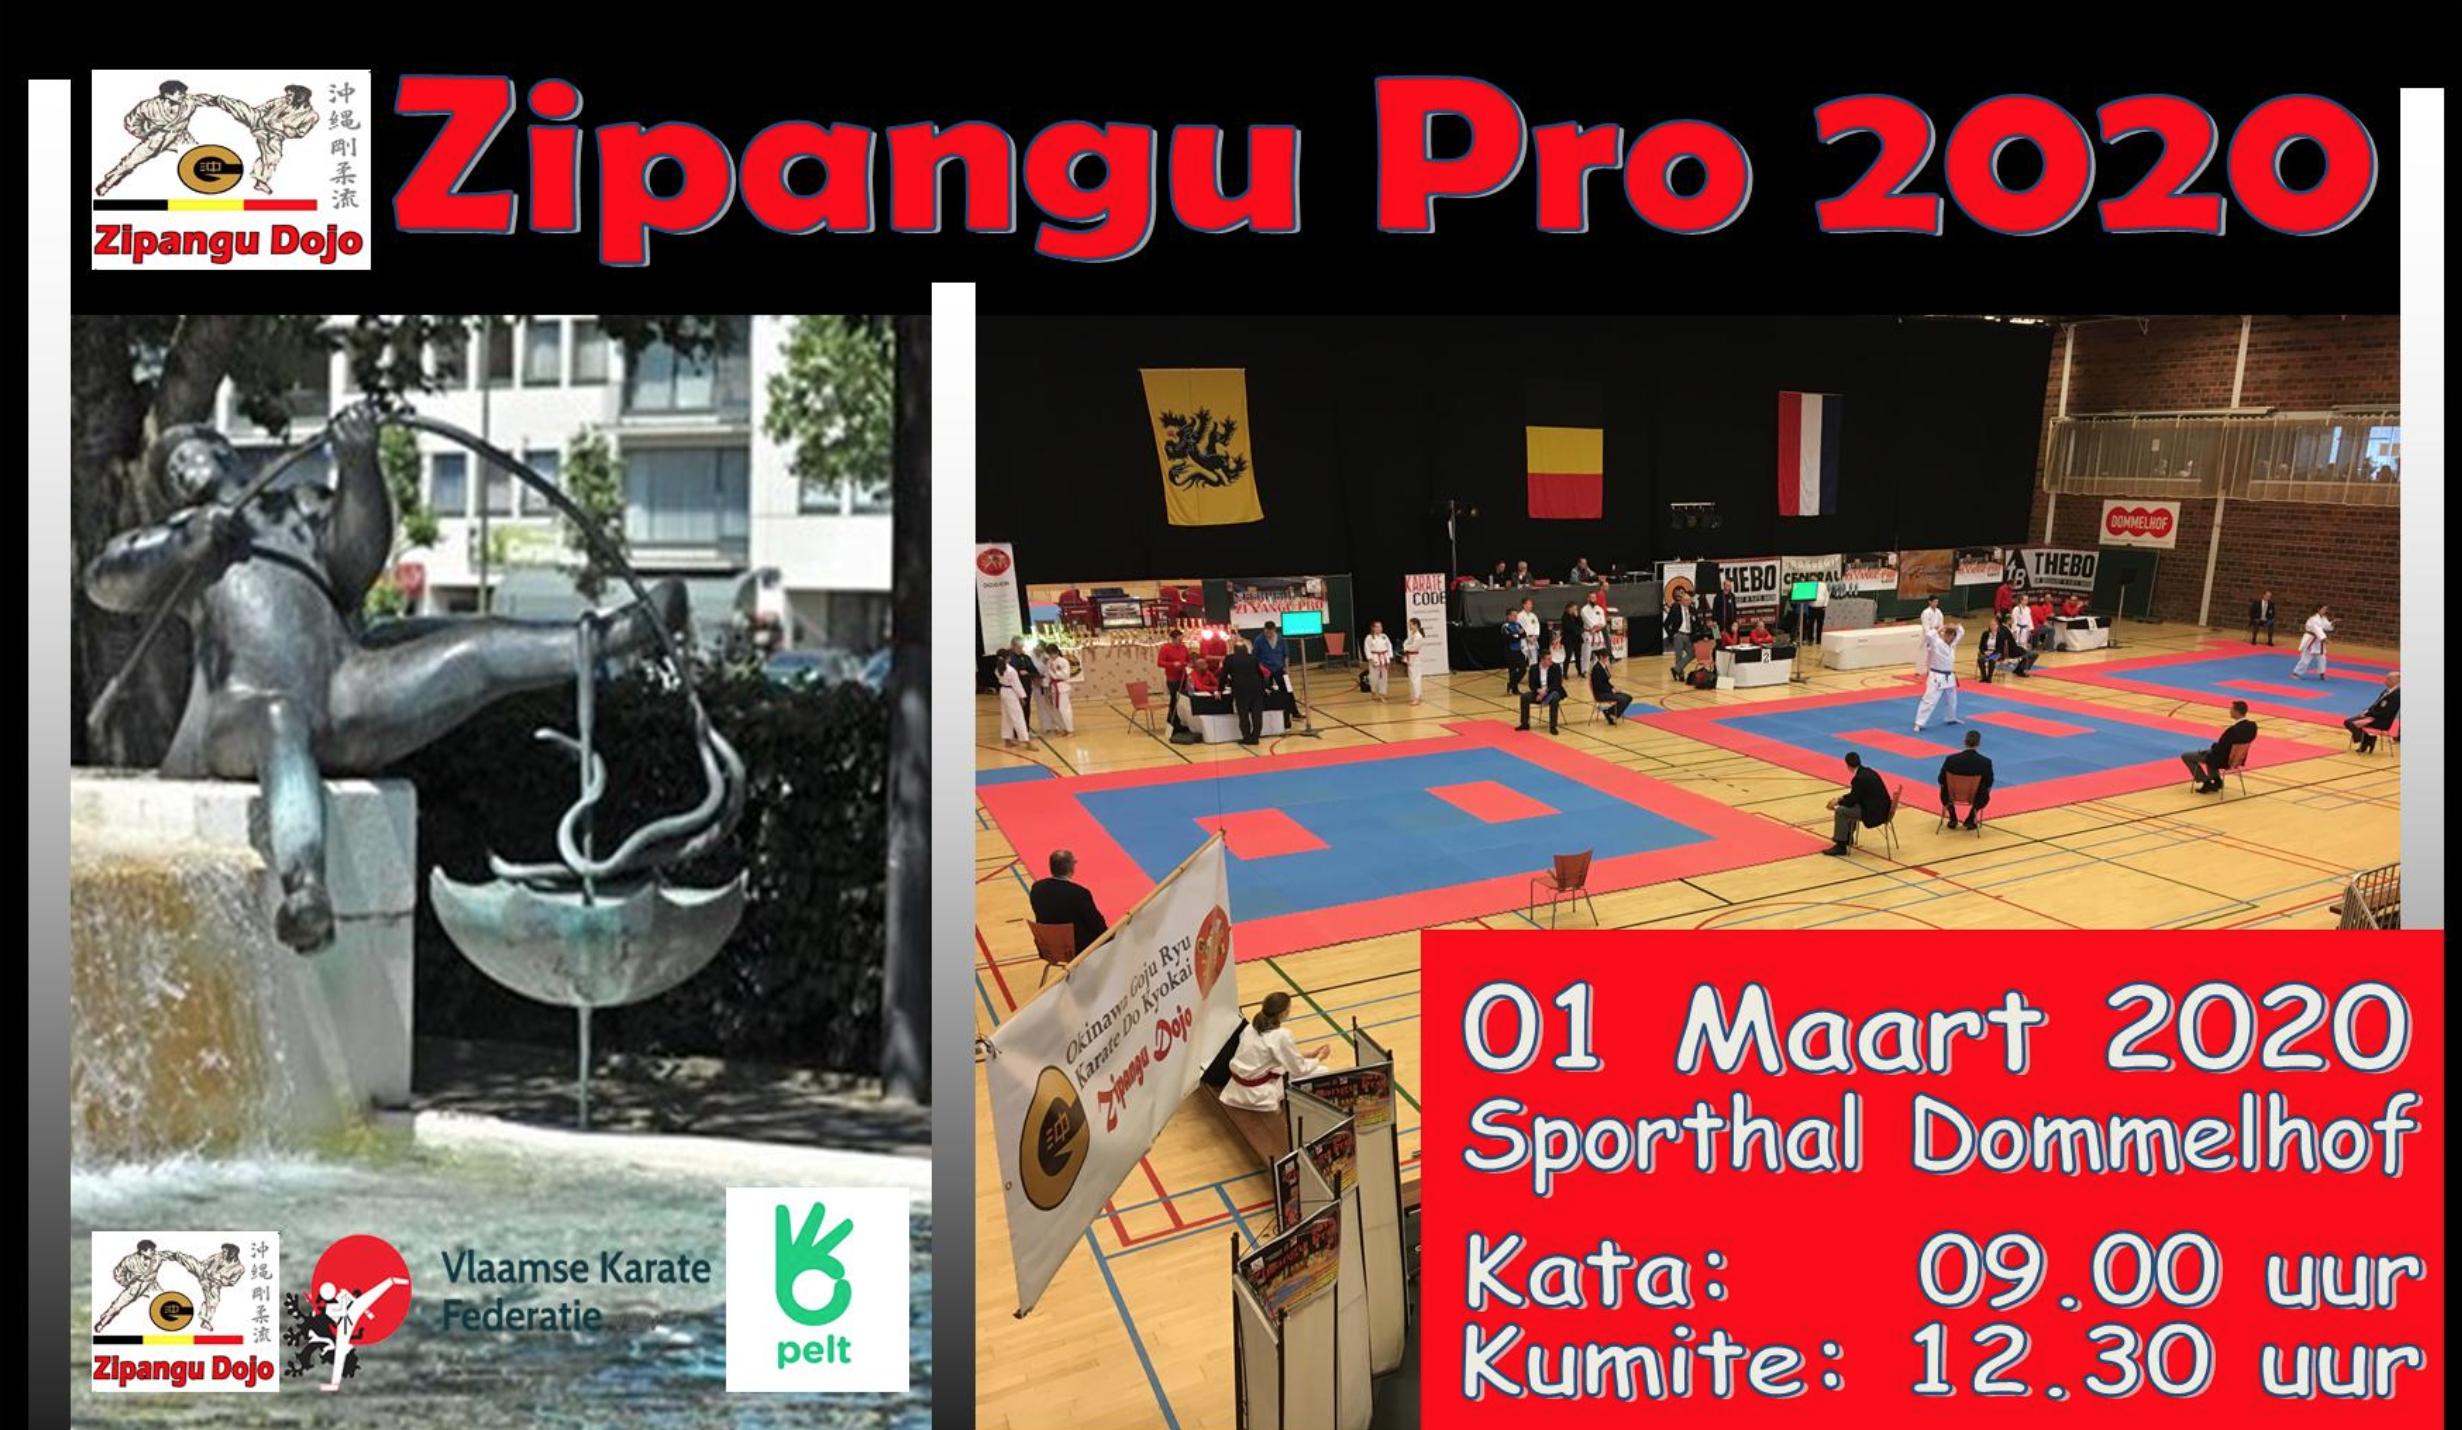 Schermafbeelding 2020 01 28 om 19.01.45 17e Zipangu Pro Karate